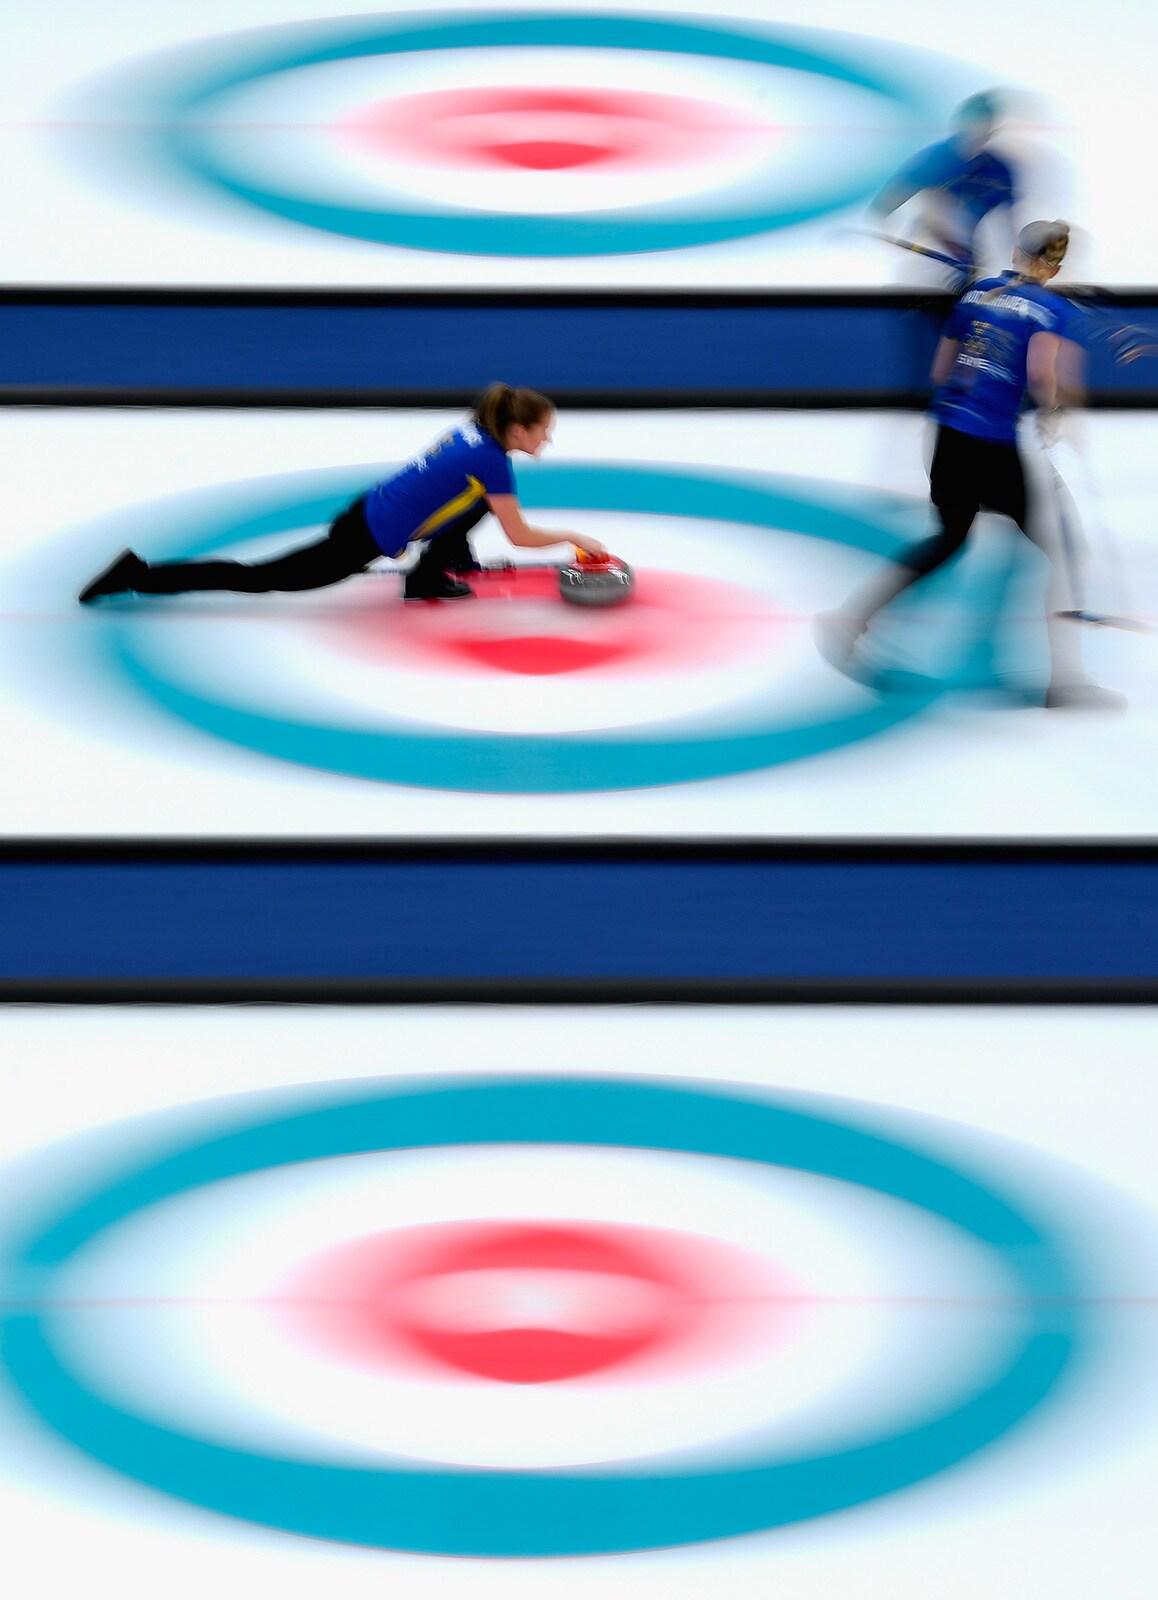 Curling - Women gold medal game